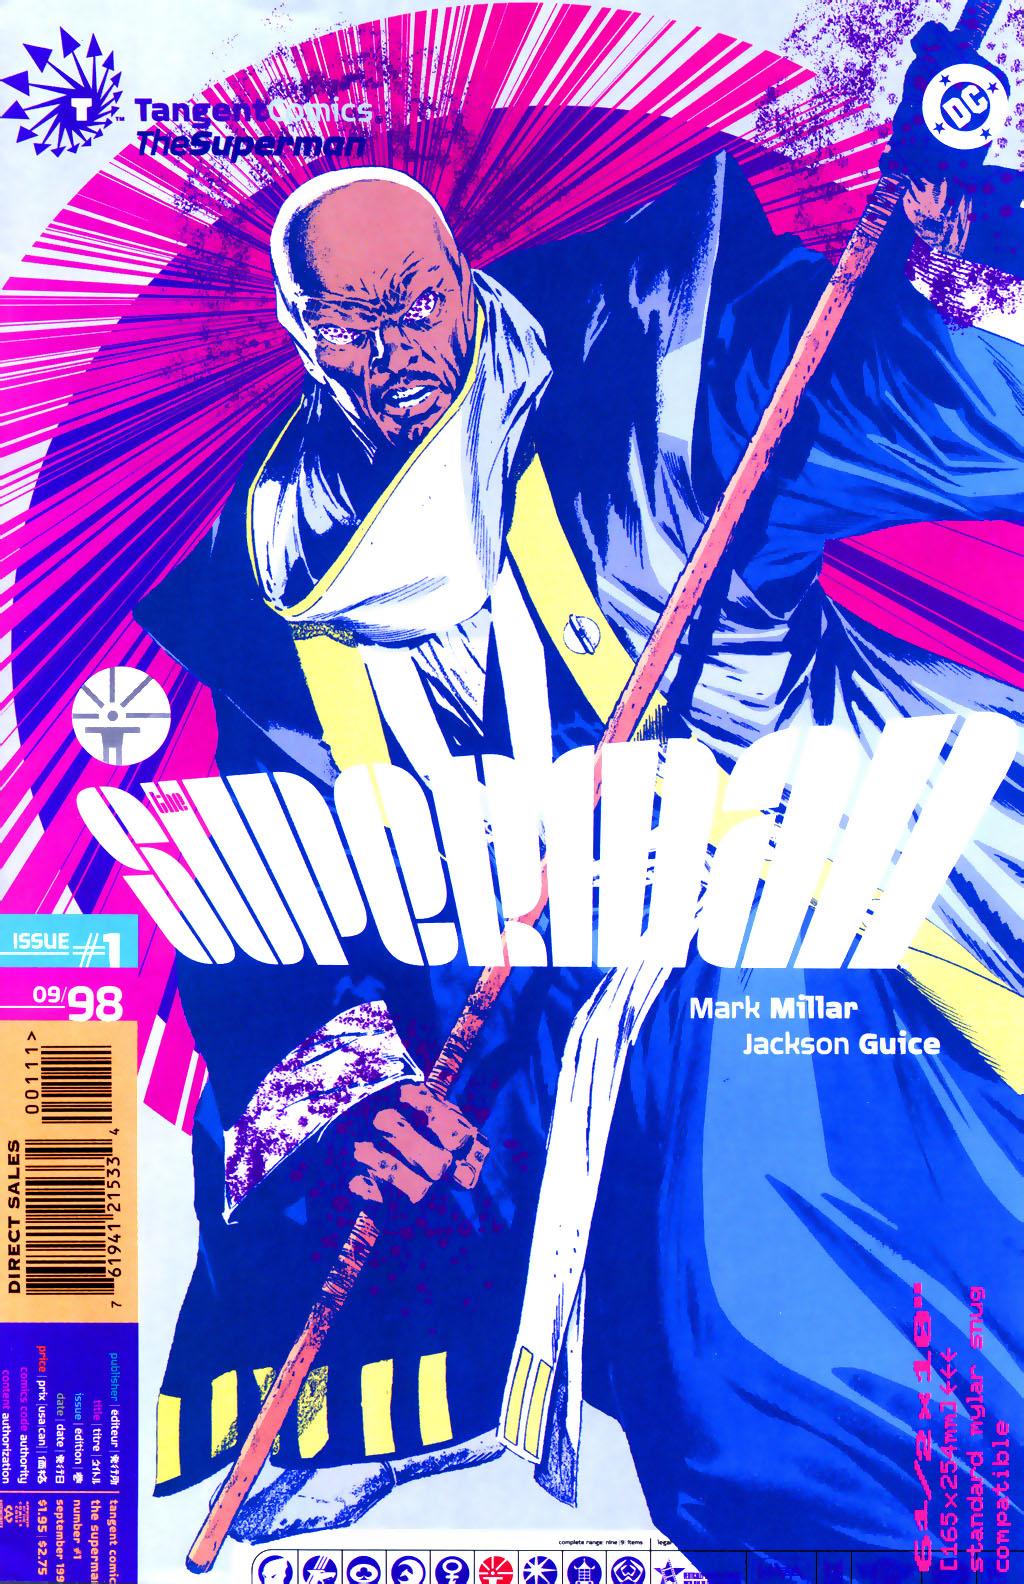 Read online Tangent Comics/ The Superman comic -  Issue # Full - 1